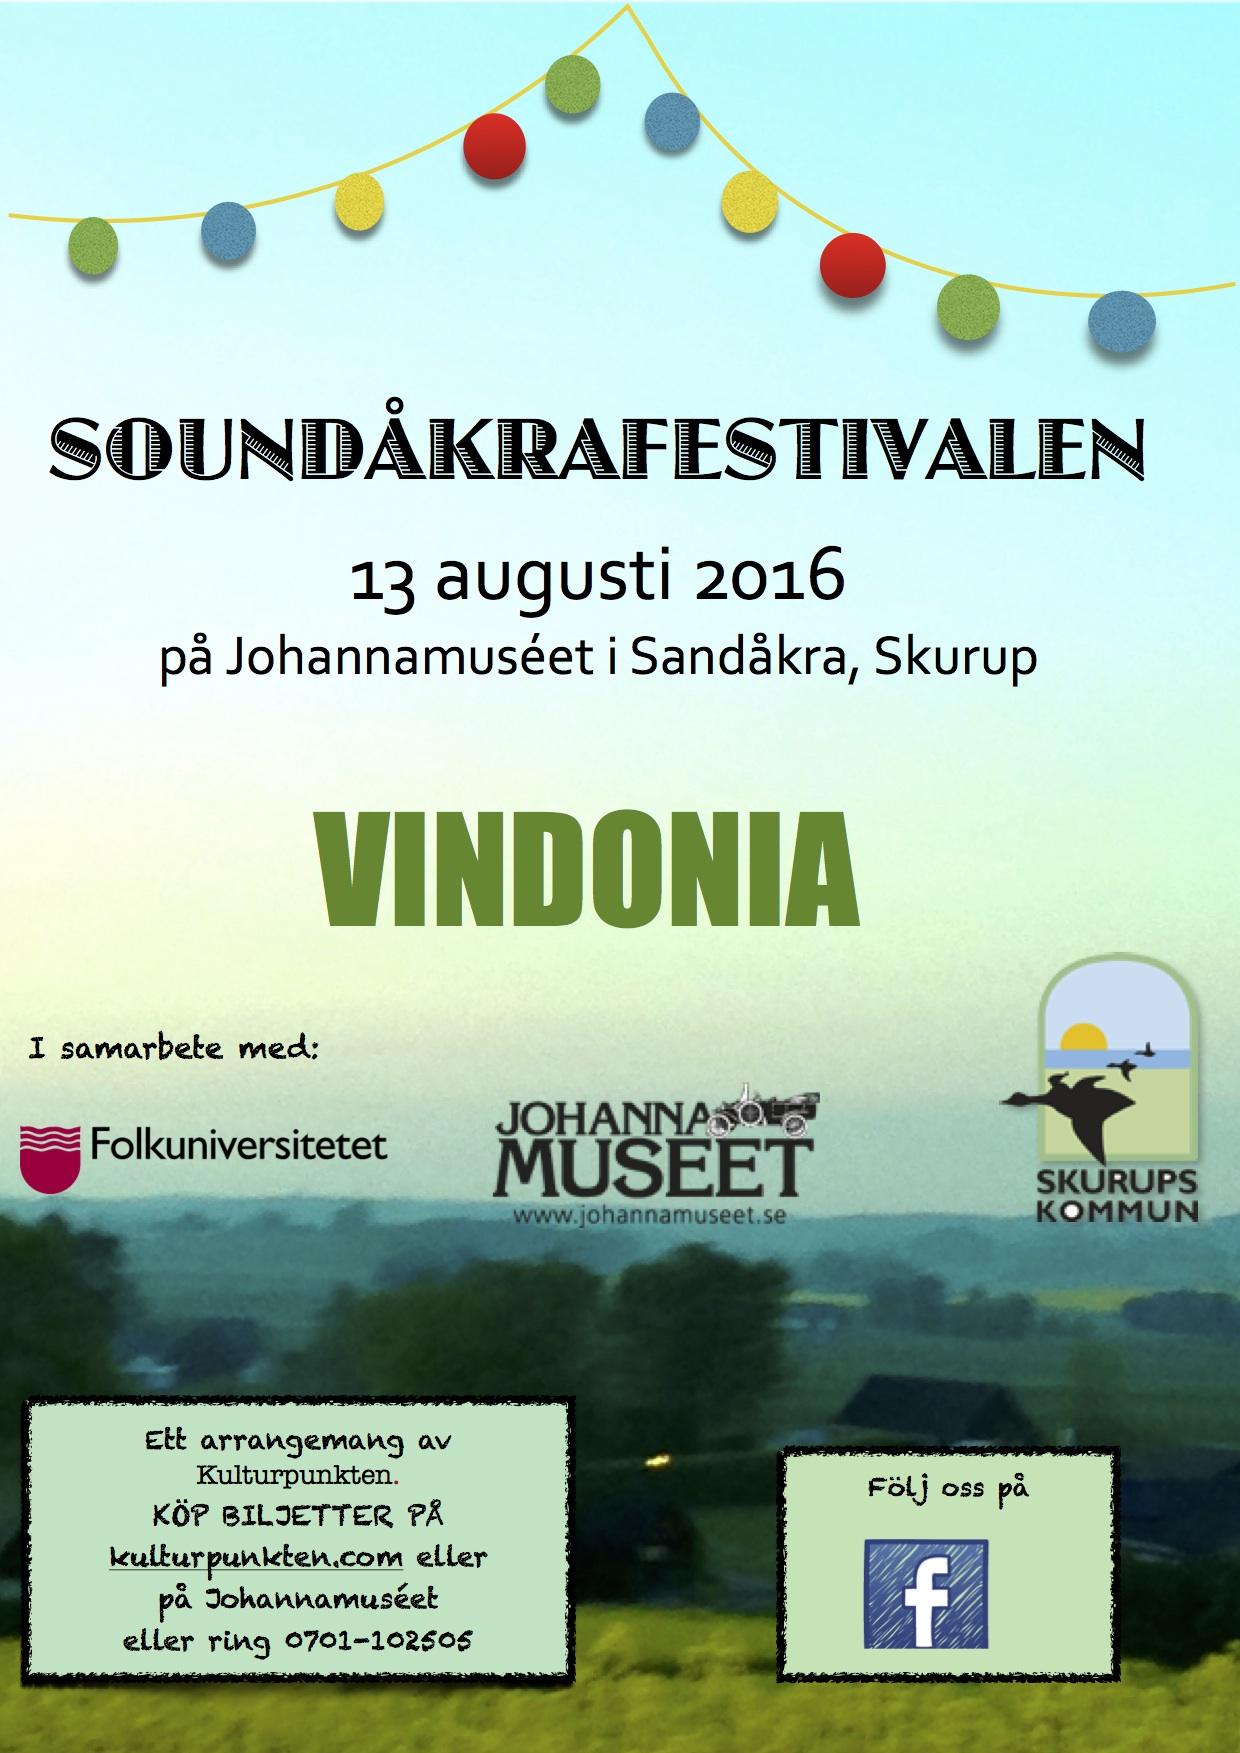 soundåkrafestivalen.jpg